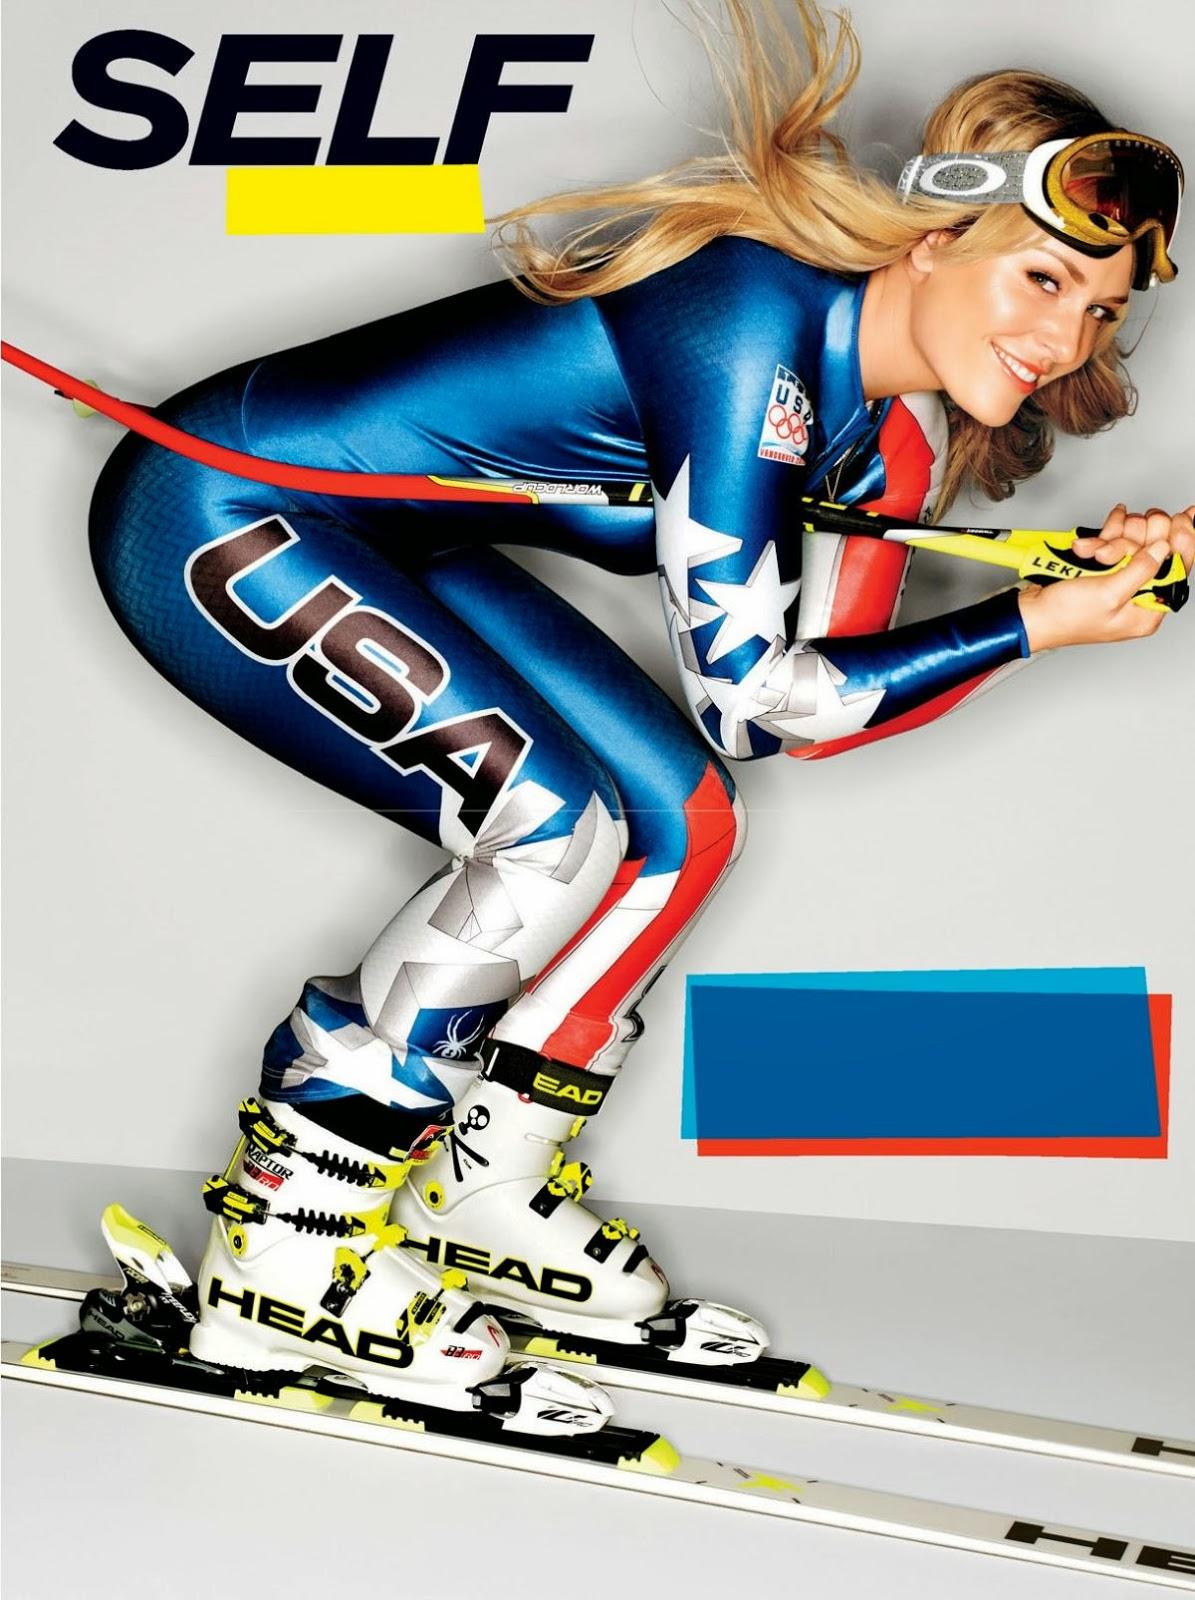 Lindsey vonn in self magazine february 2014